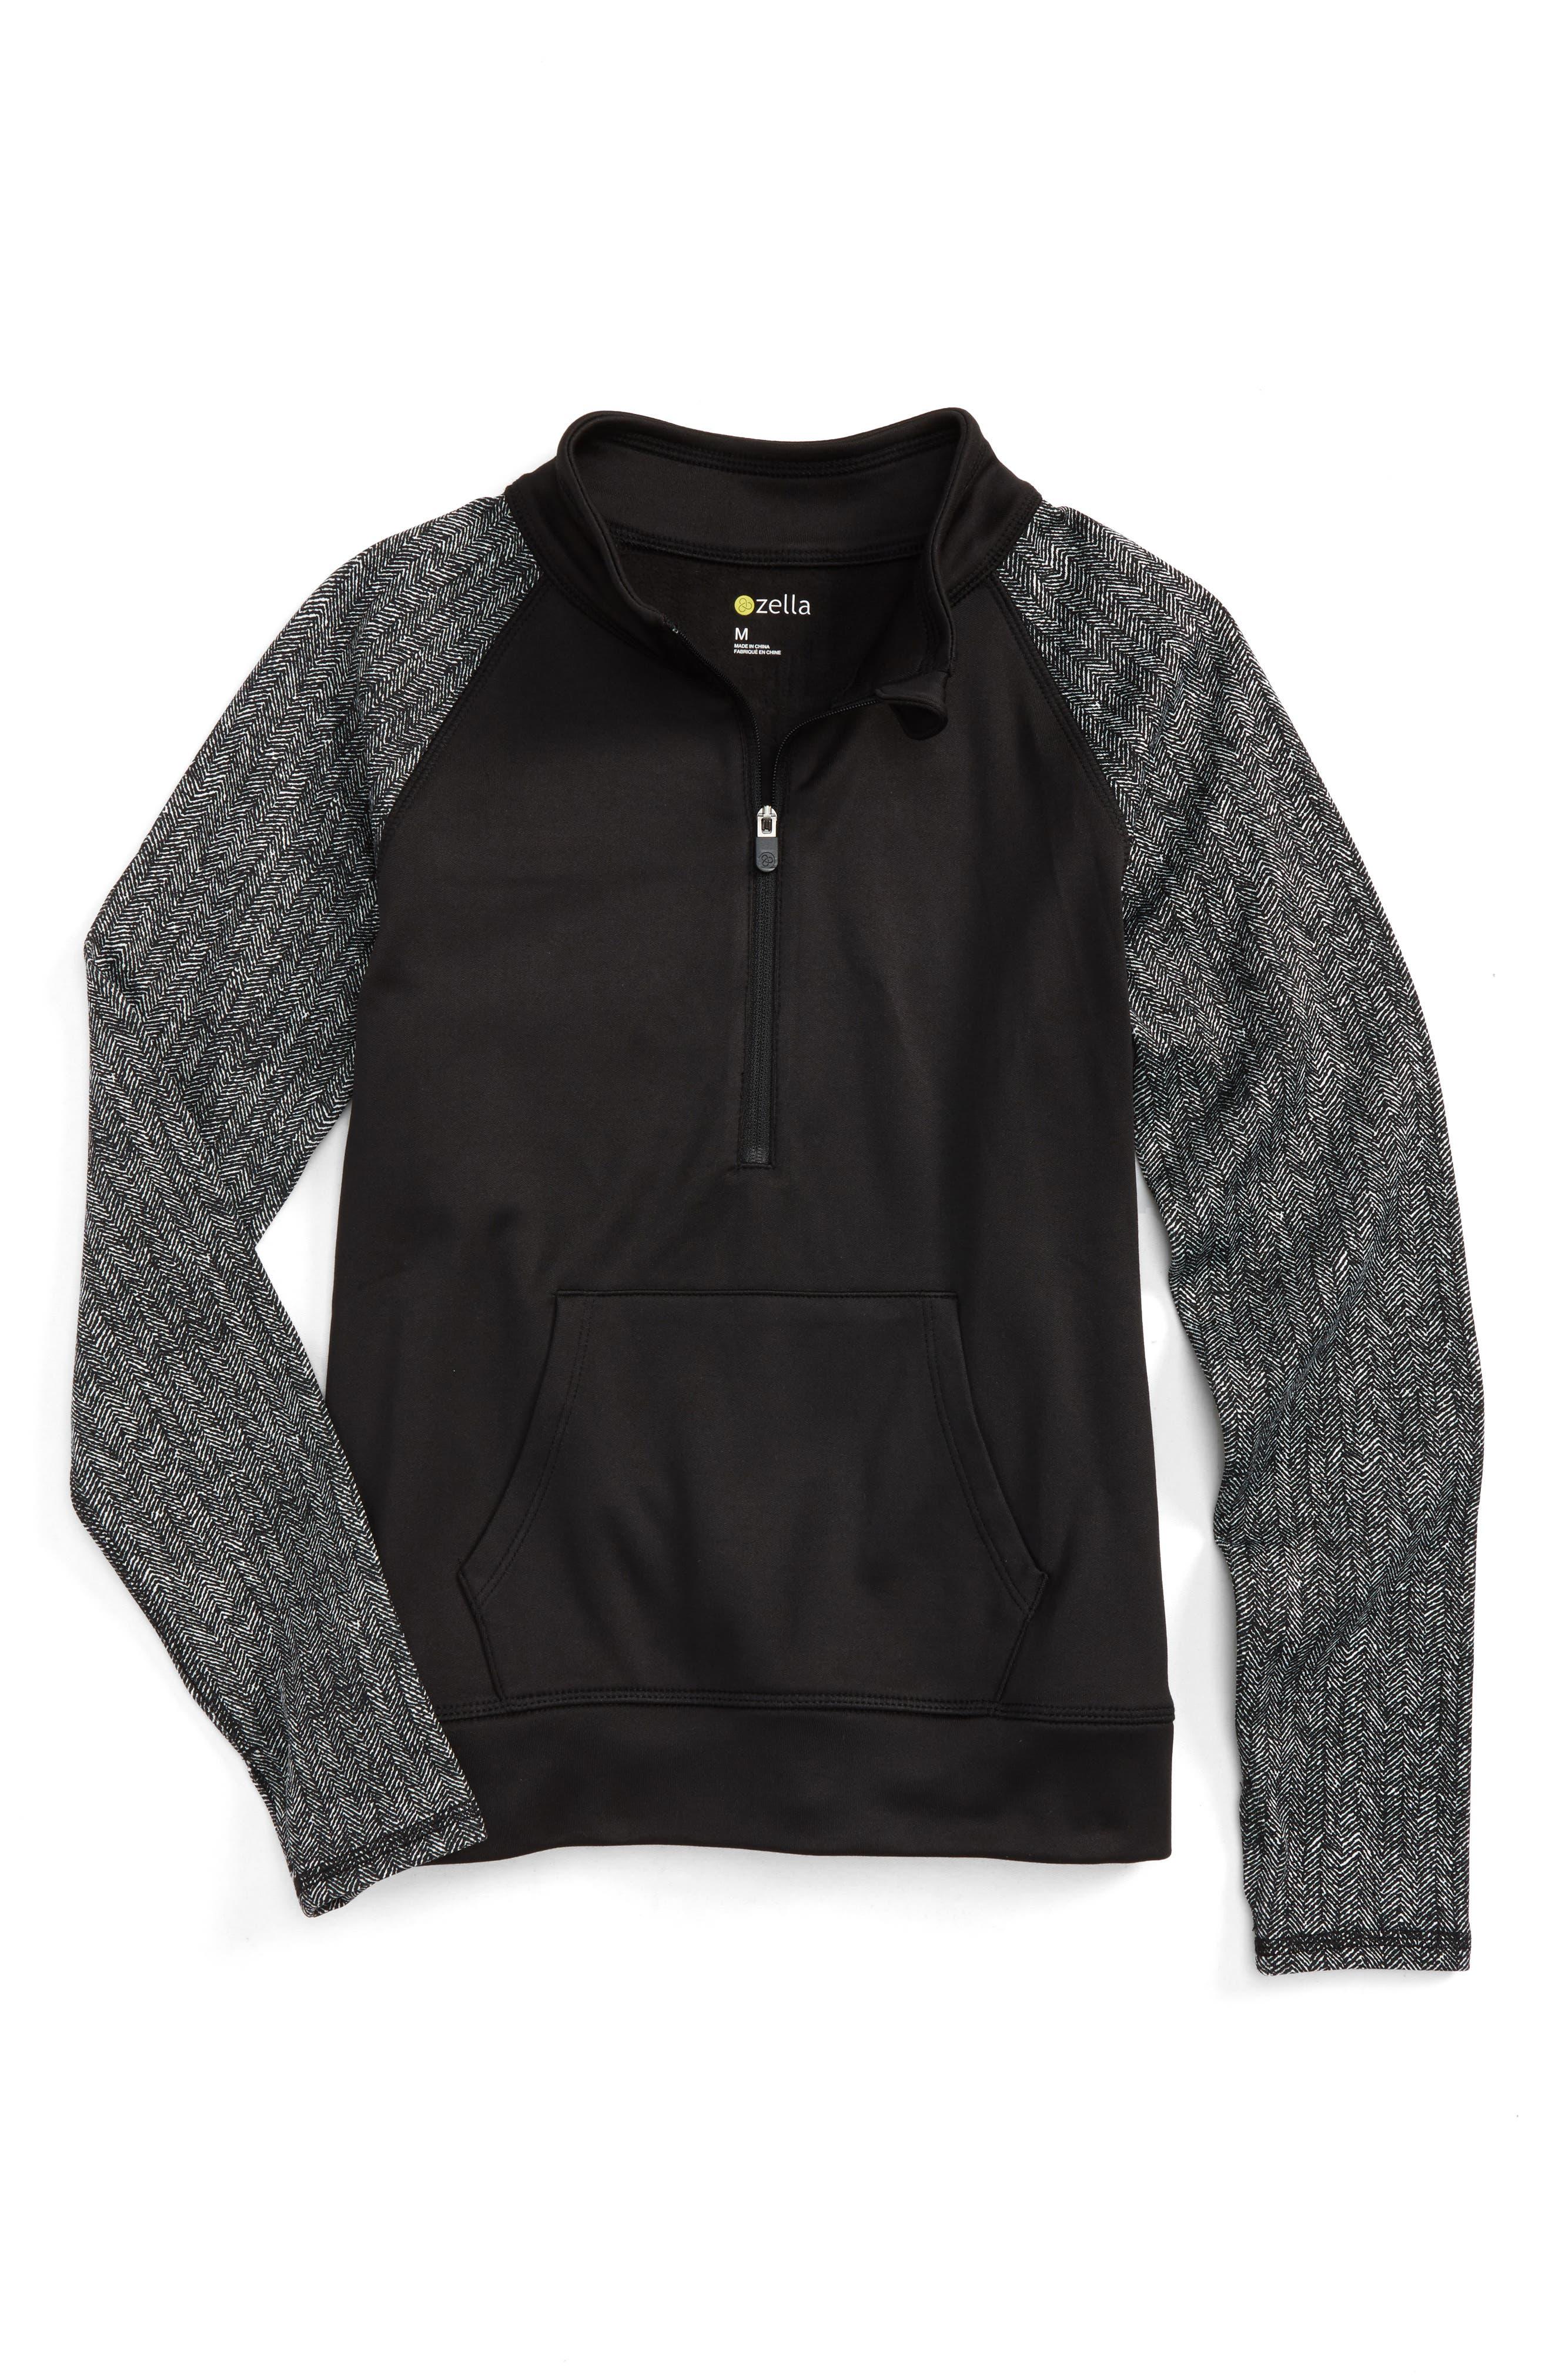 Flex Tech Quarter Zip Pullover,                         Main,                         color, Black- White Herringbone